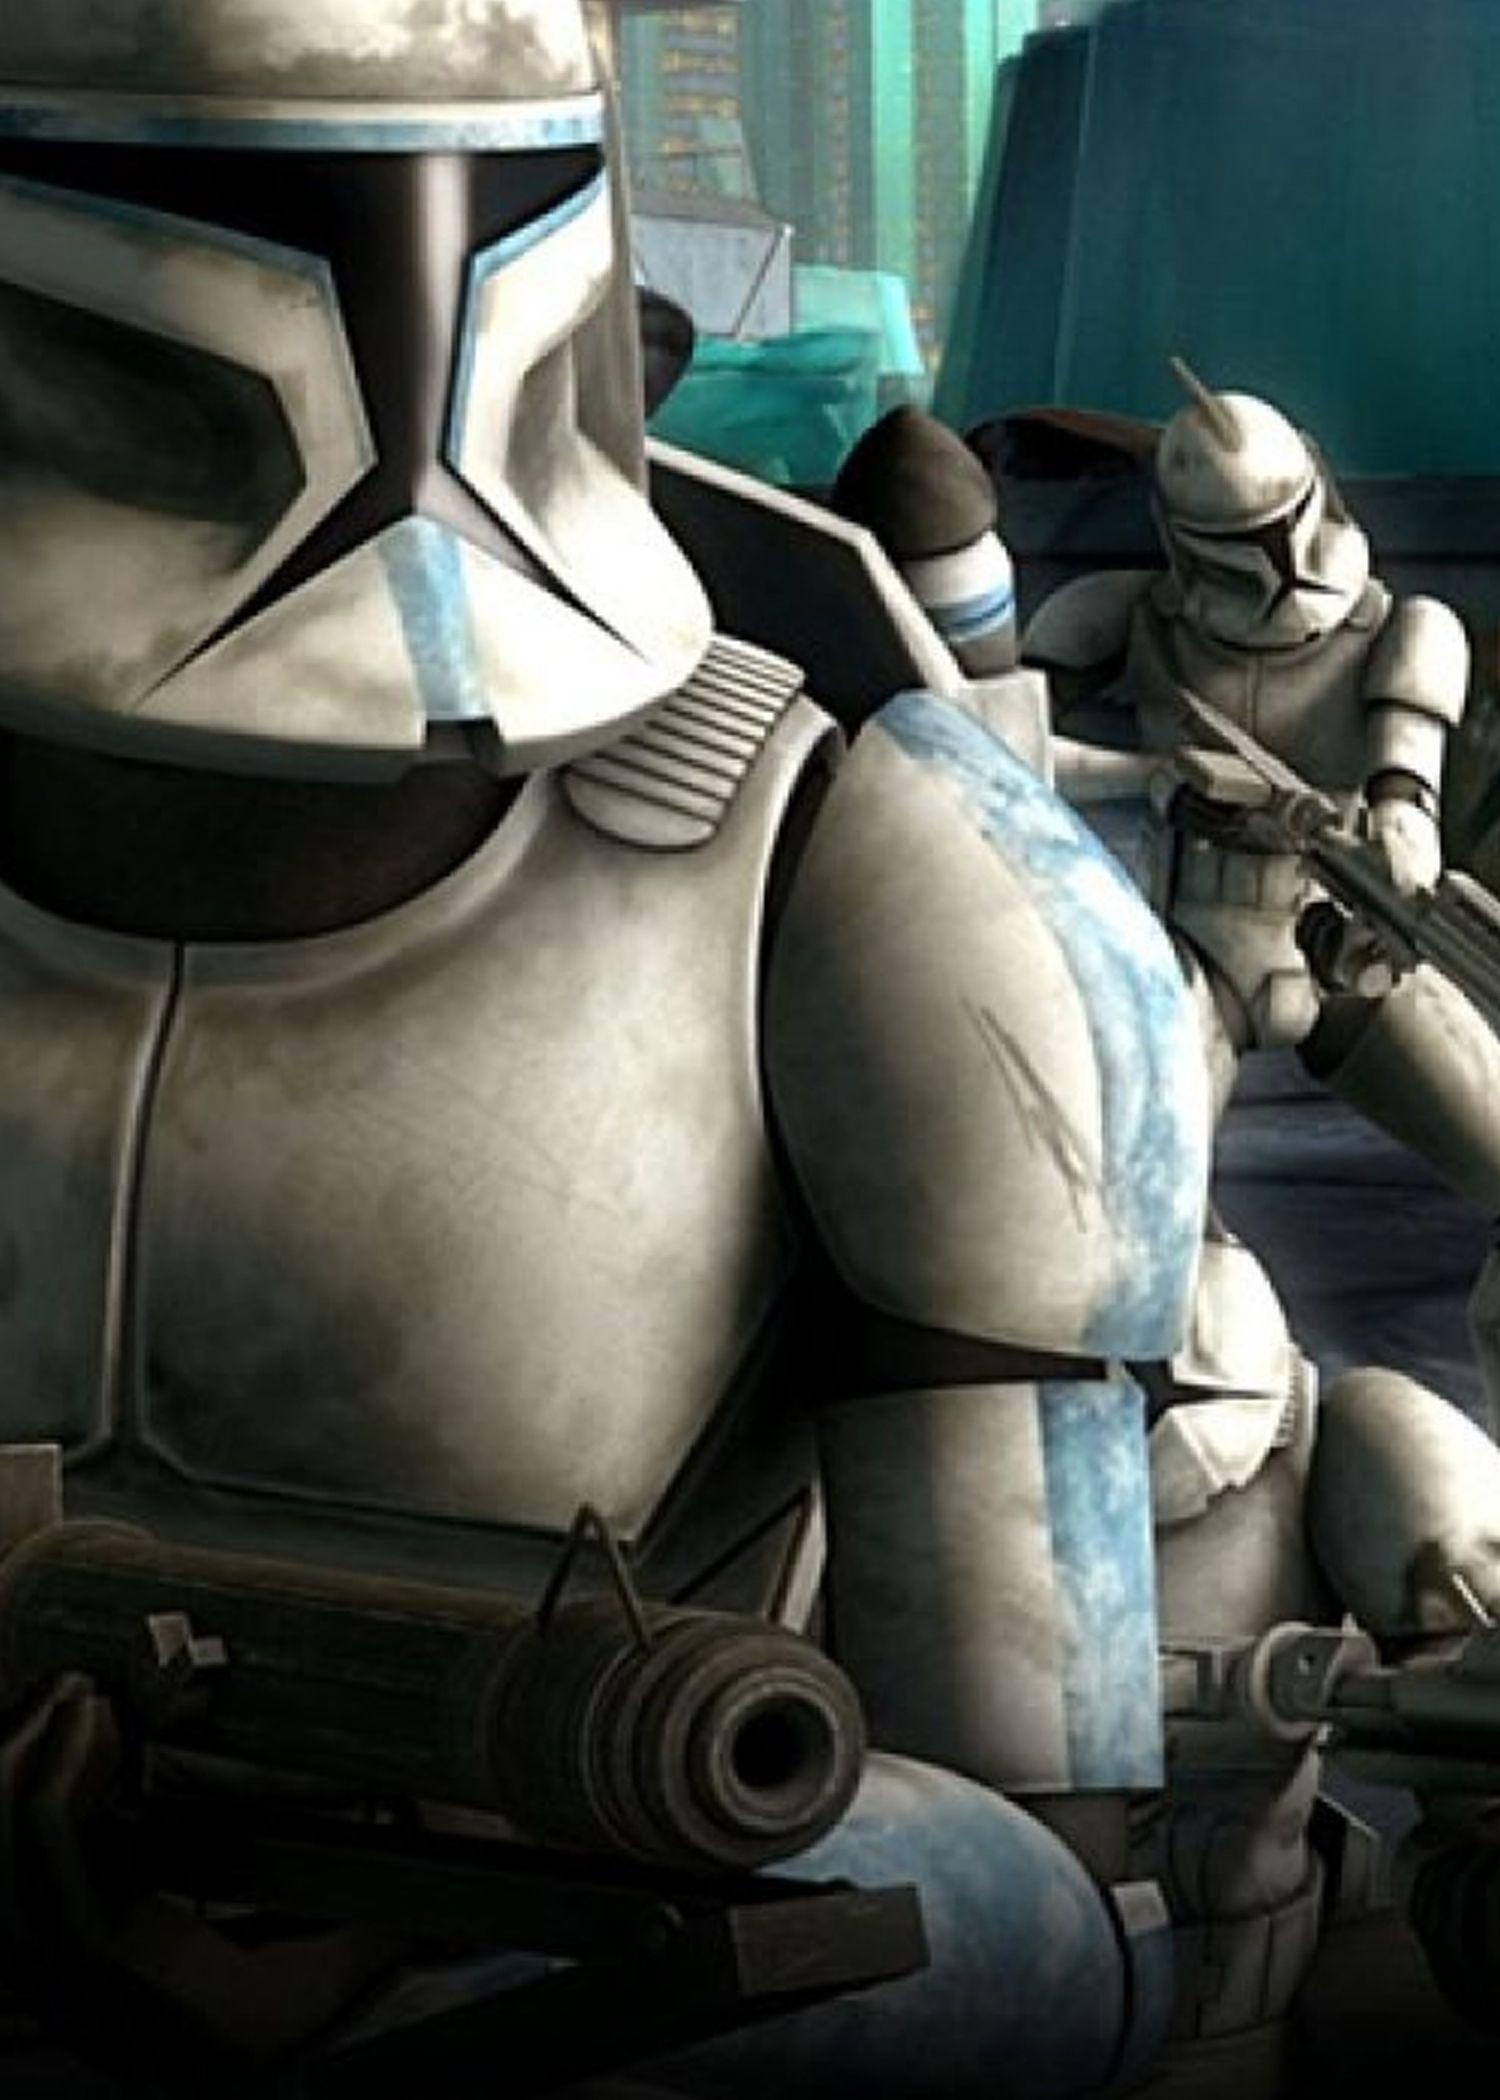 154291 clone trooper iphone wallpaper